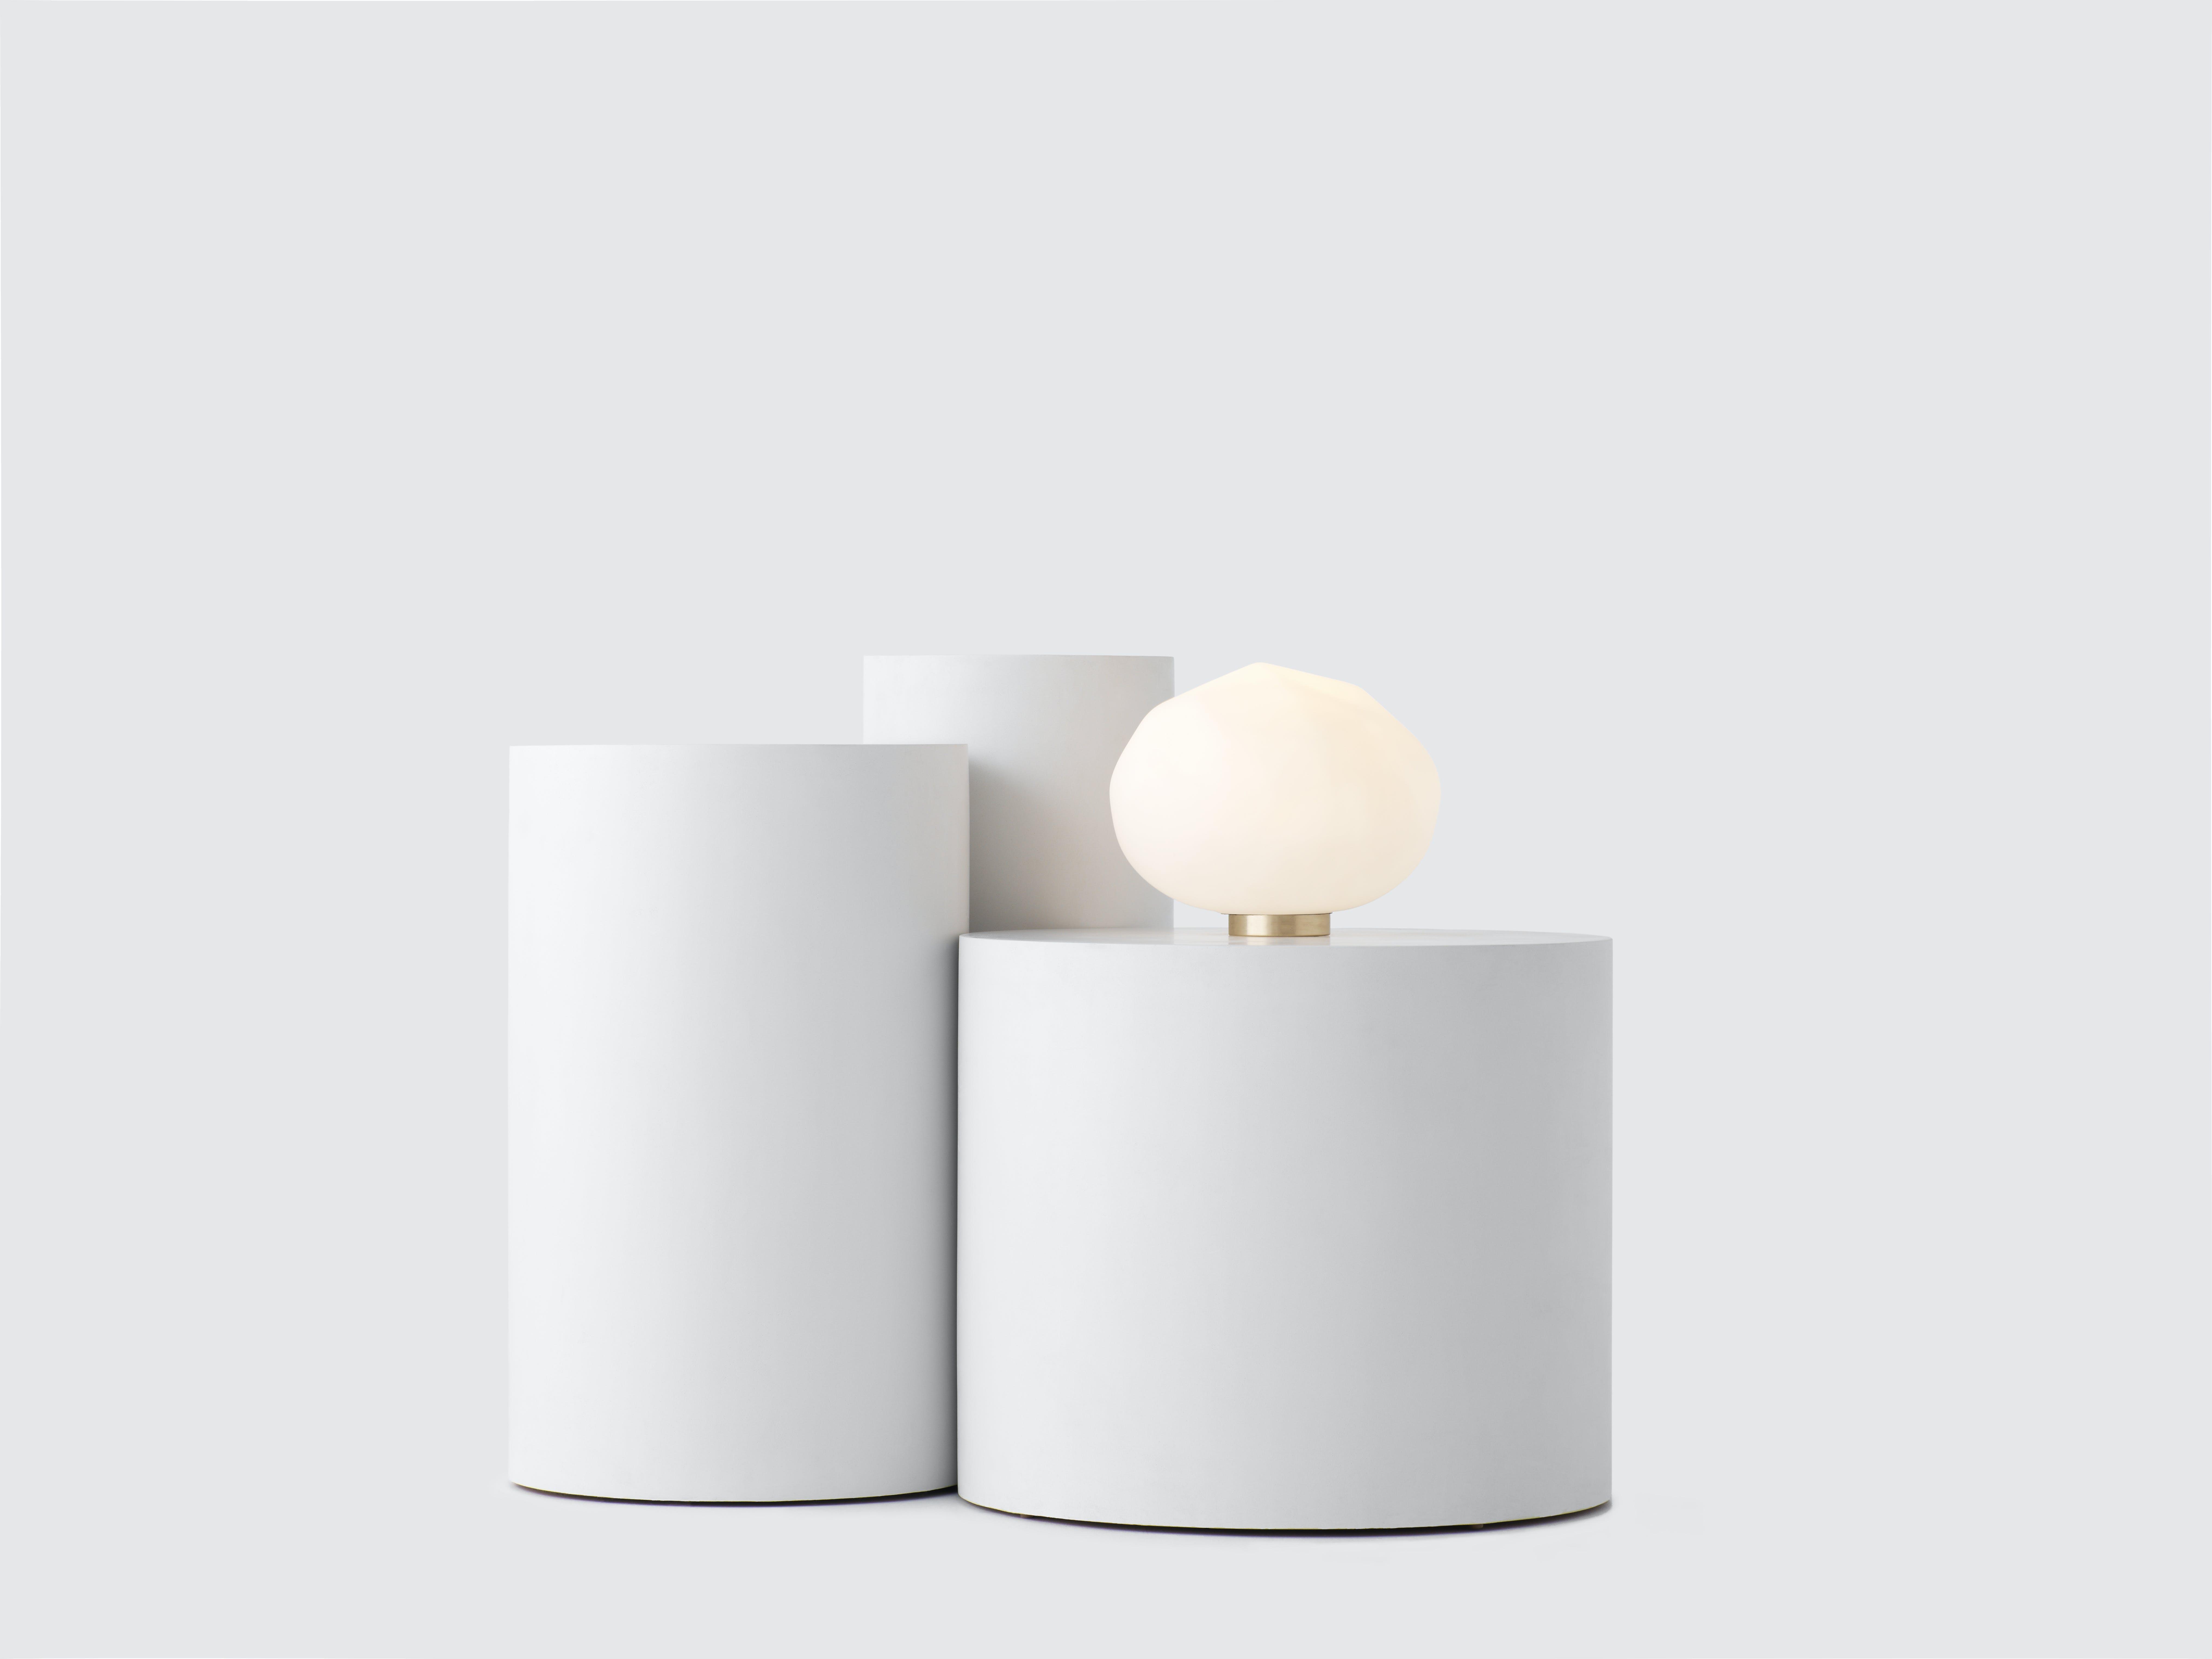 Resident-furniture-parison-table-light-insitu-haute-living